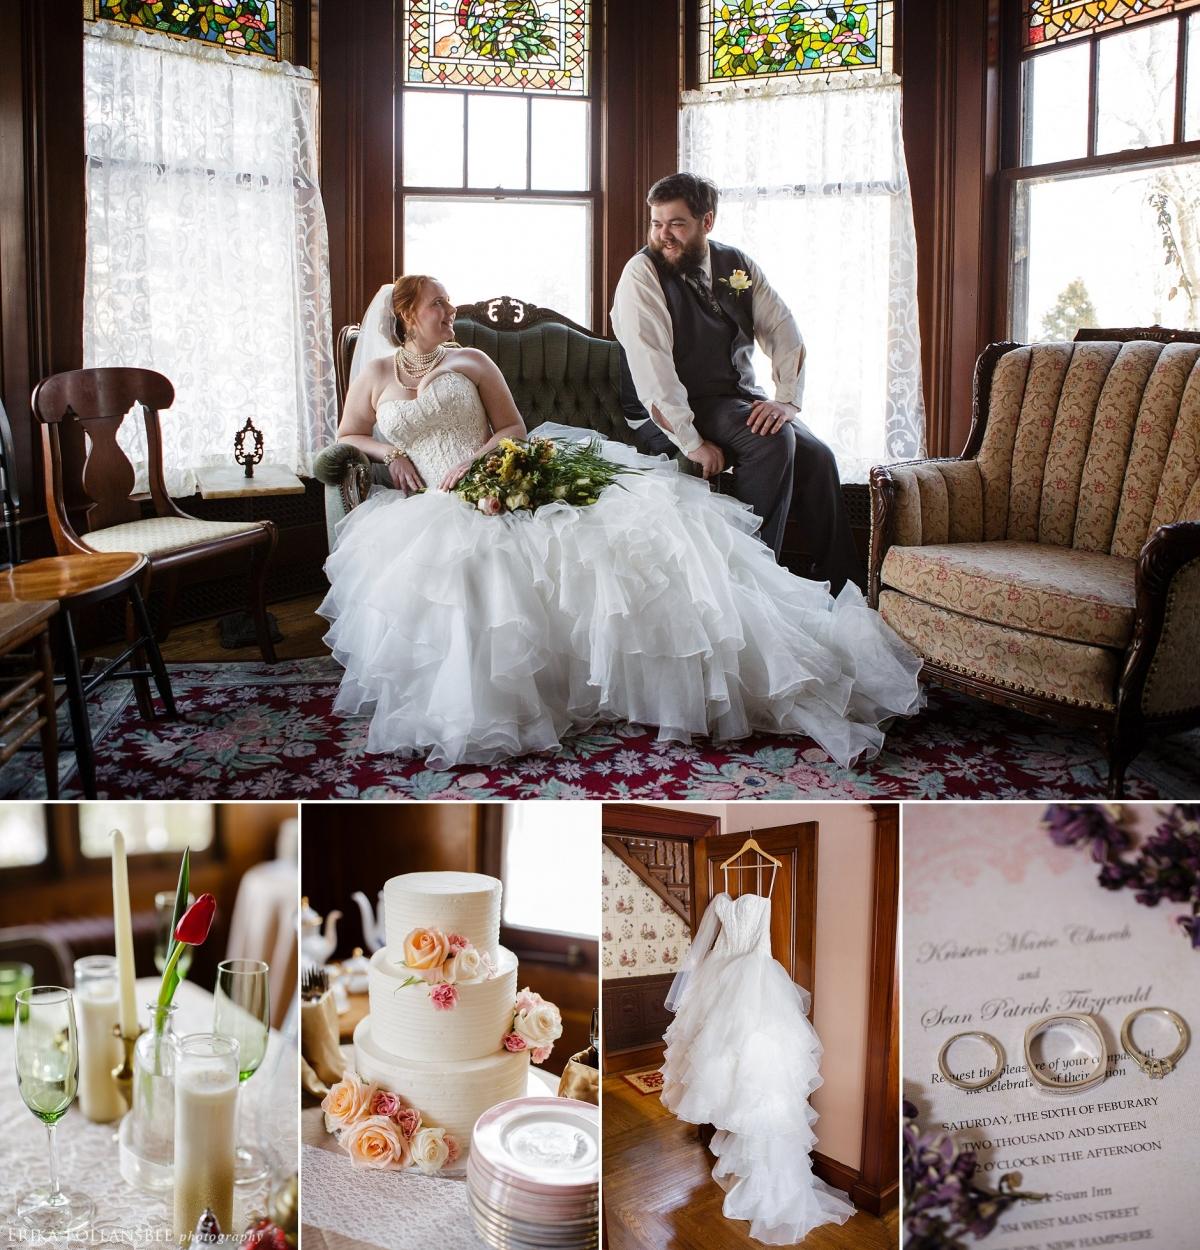 Wedding Dresses In Nh 72 Epic Vintage Elegance at the